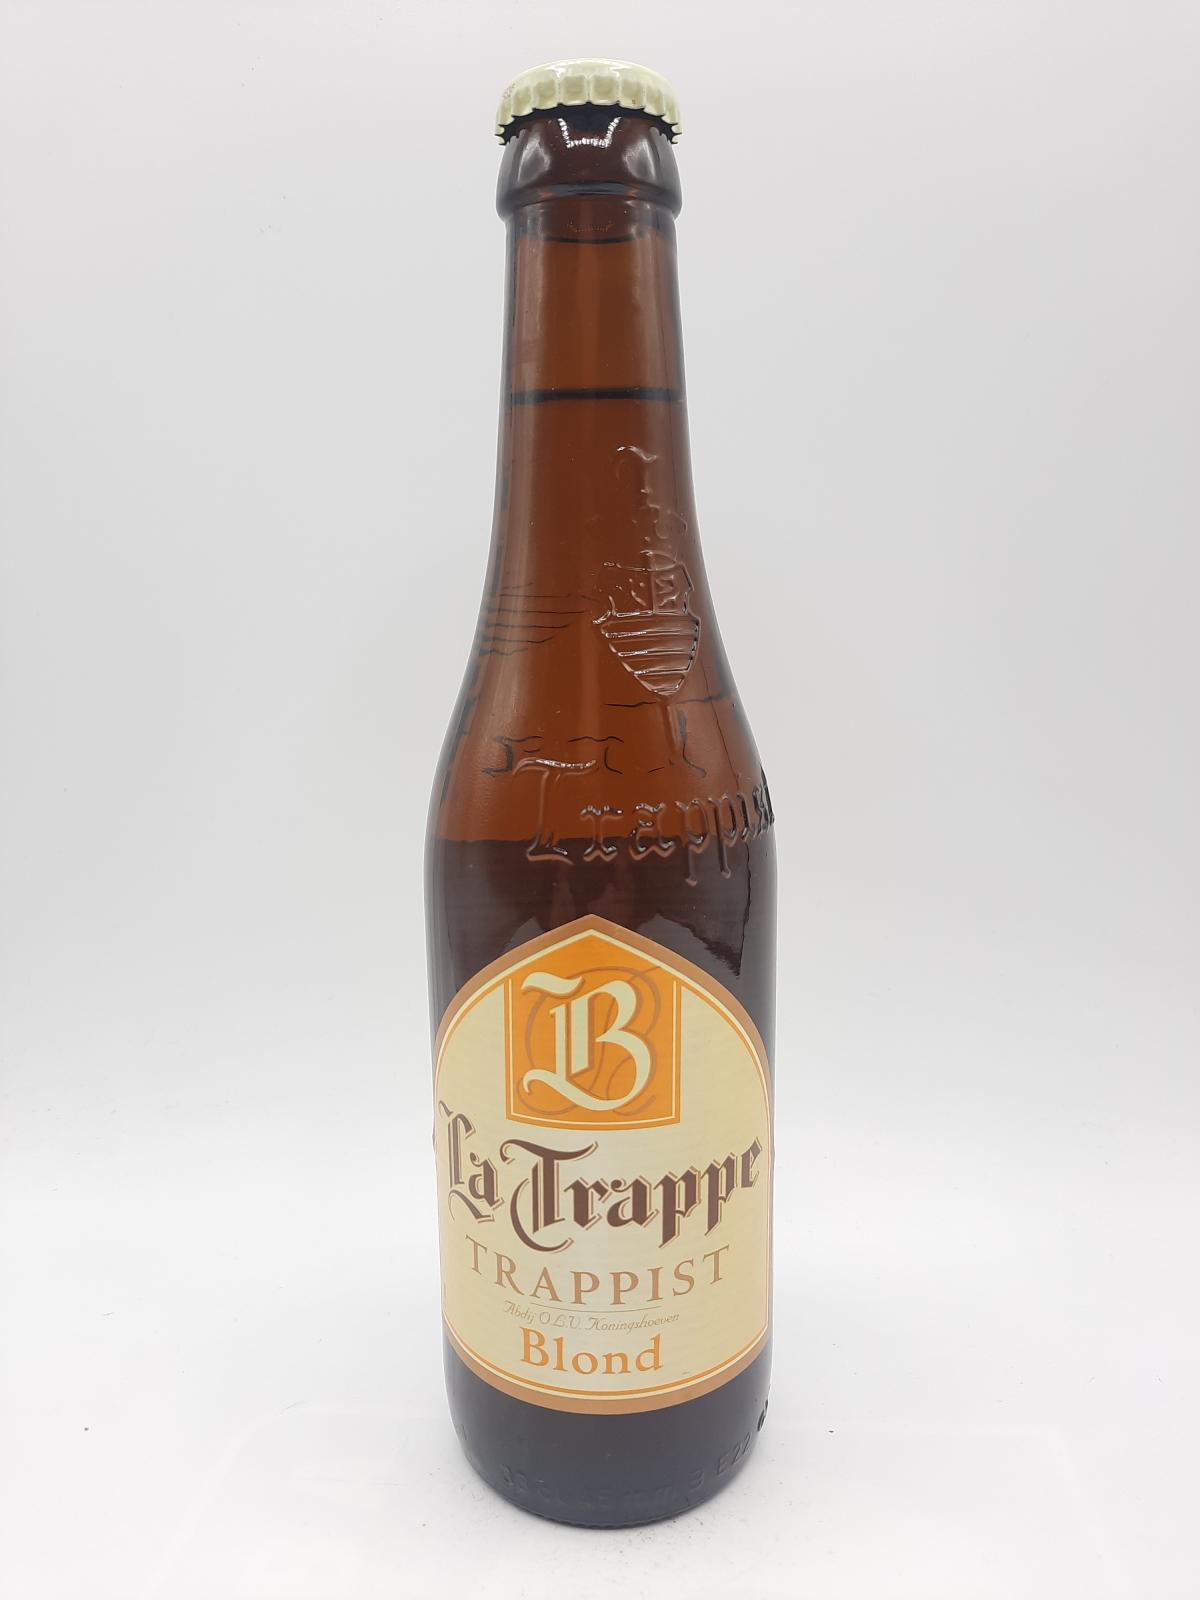 Image La Trappe Blond